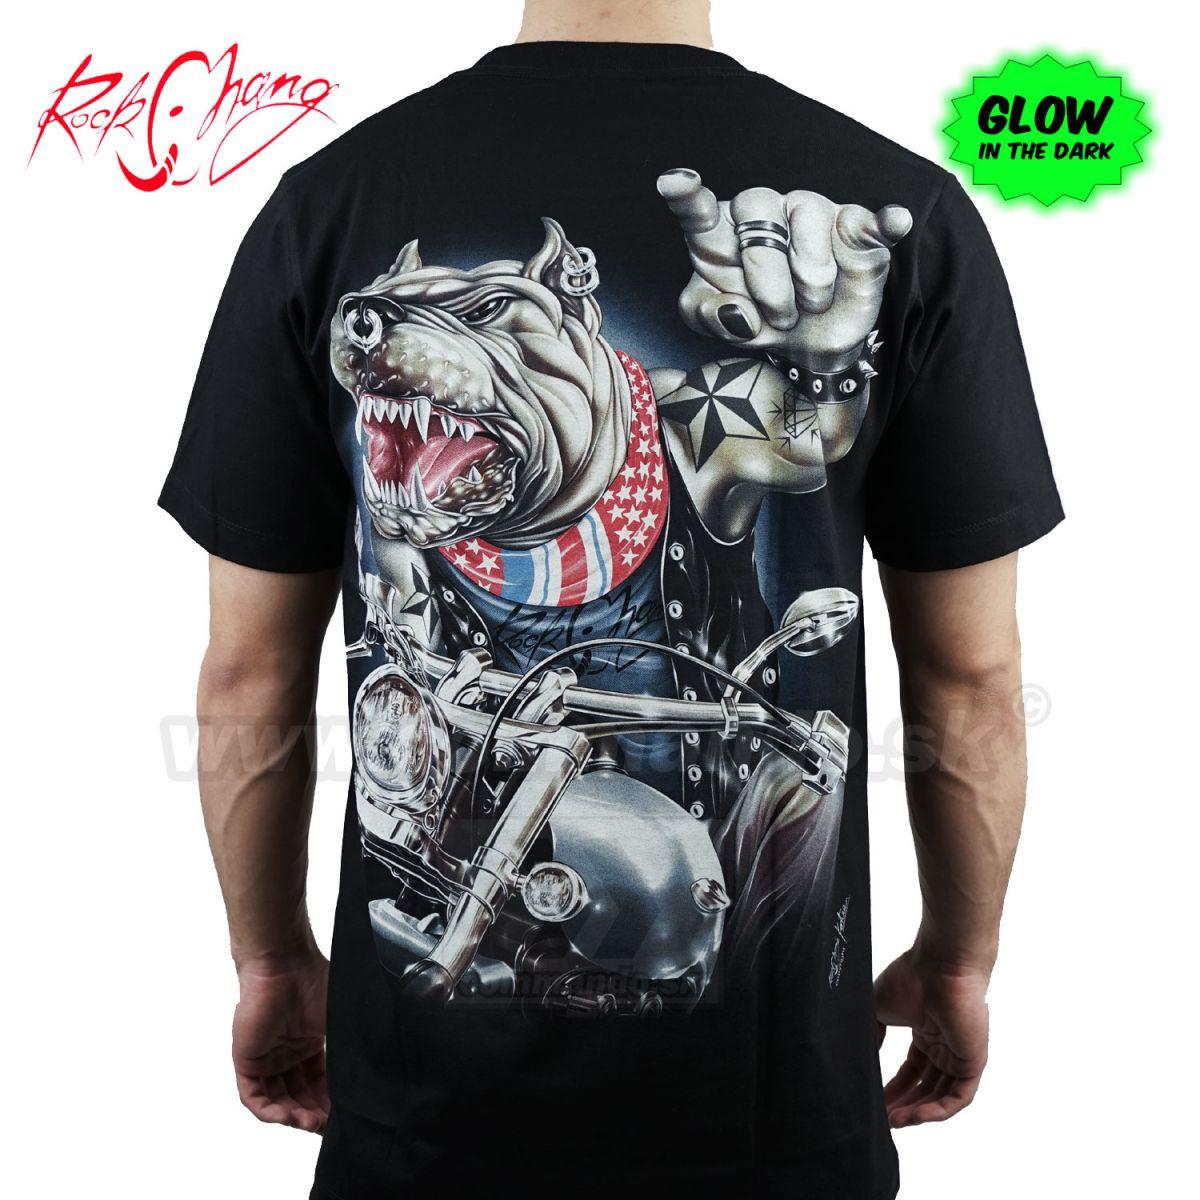 07c9a6ba36b2 Tričko Pitbull Free Rider Rock Chang GR762 T-Shirt